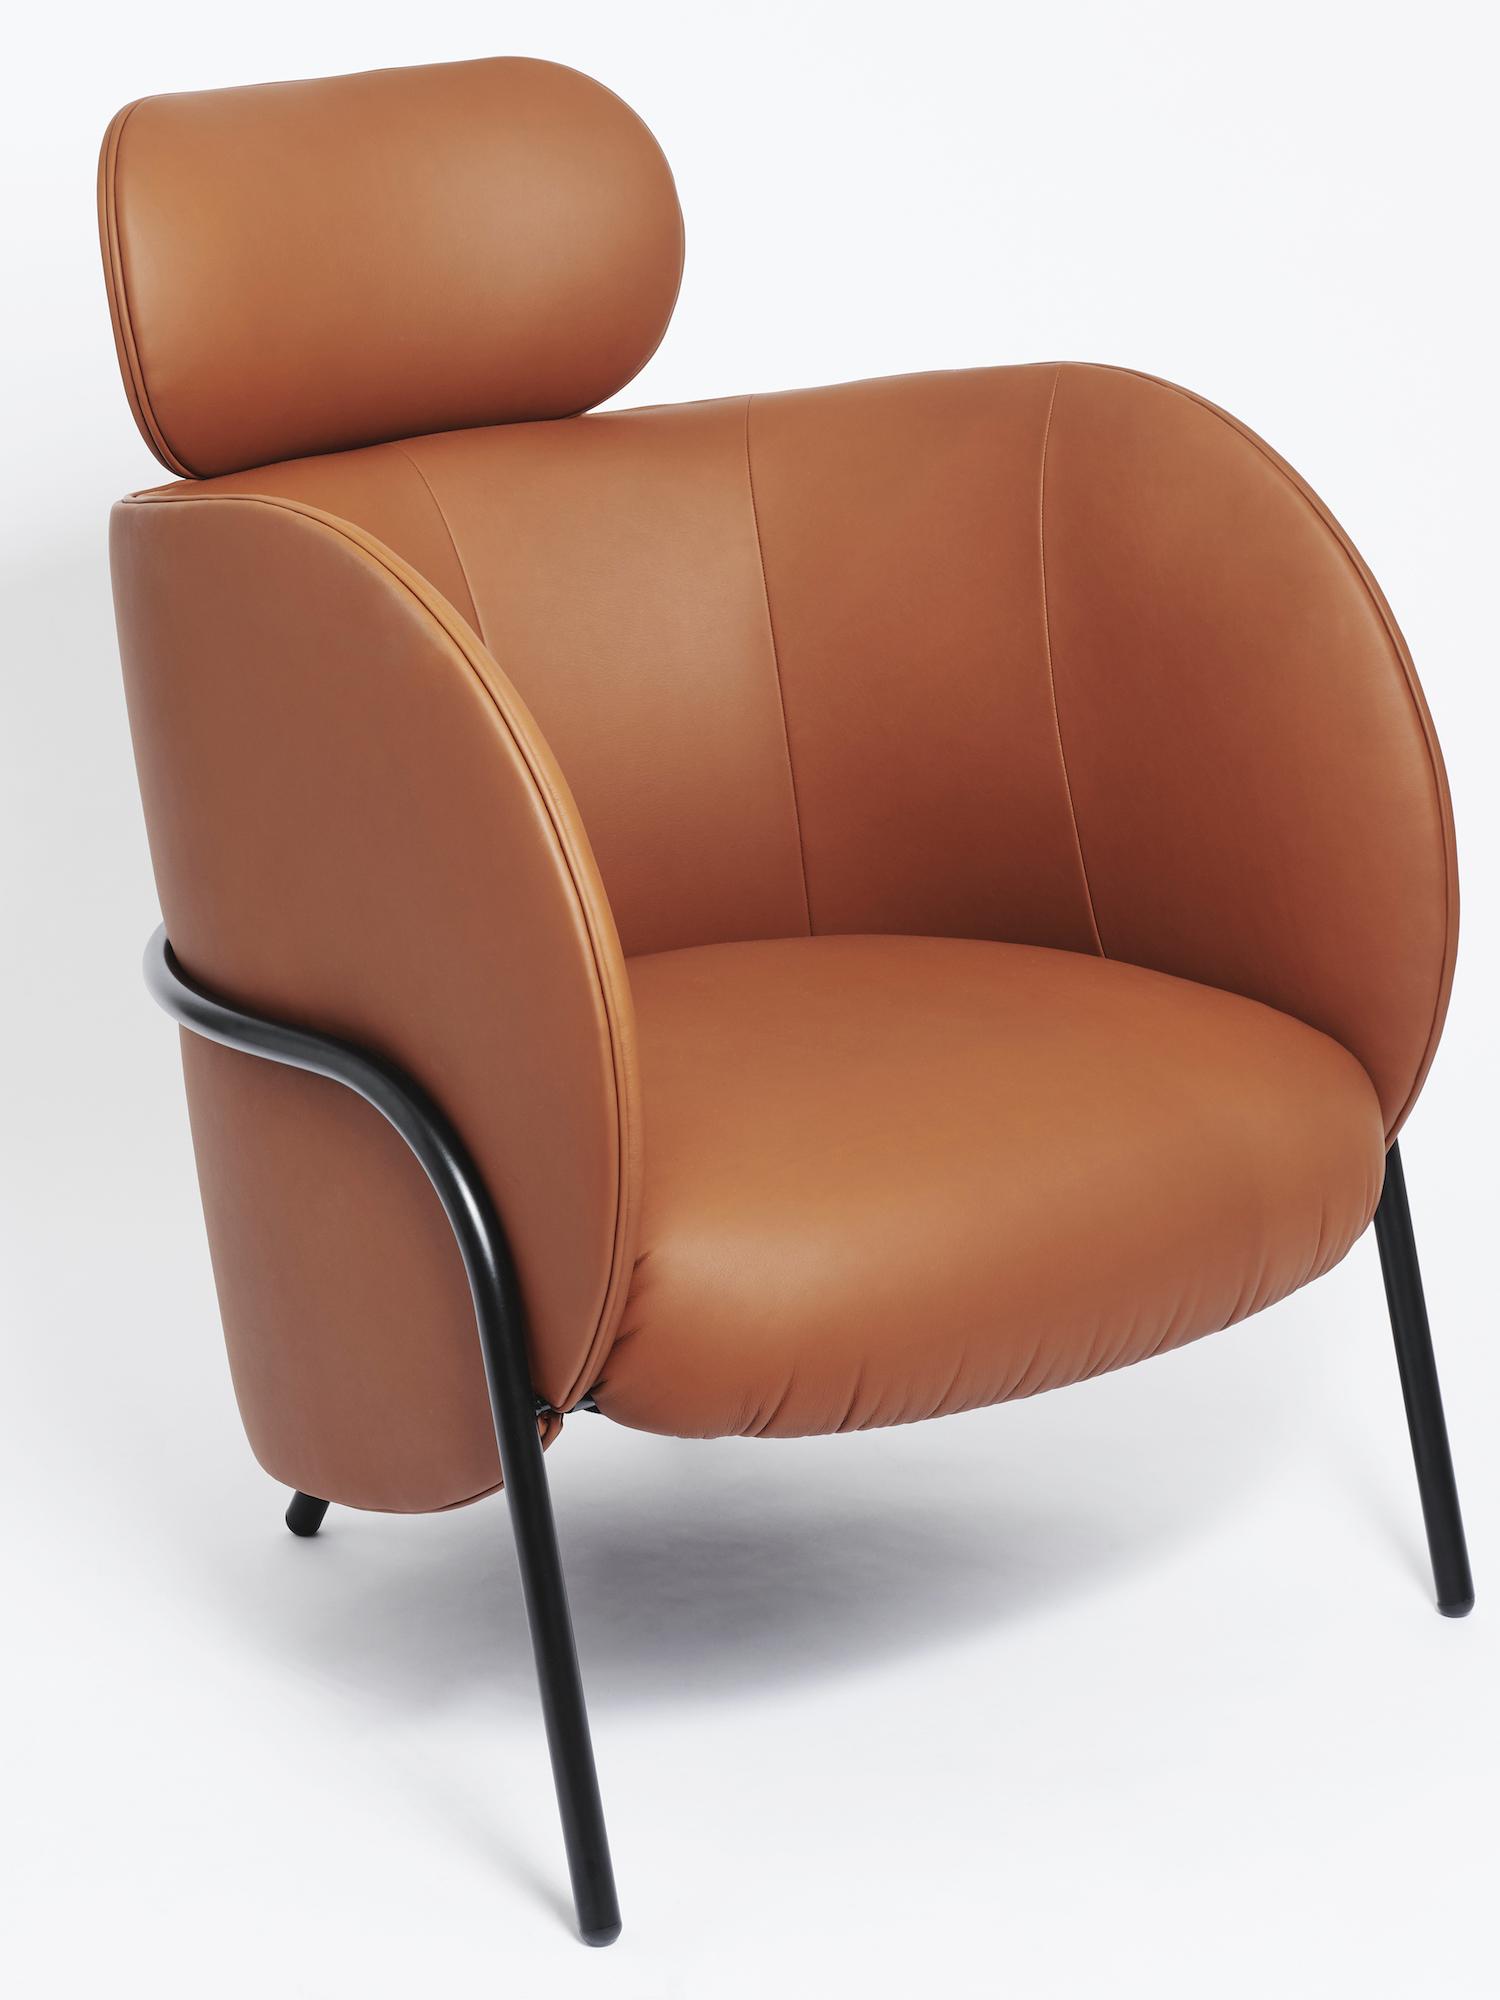 est living royce armchair nikolai kotlarczyk spo1 10